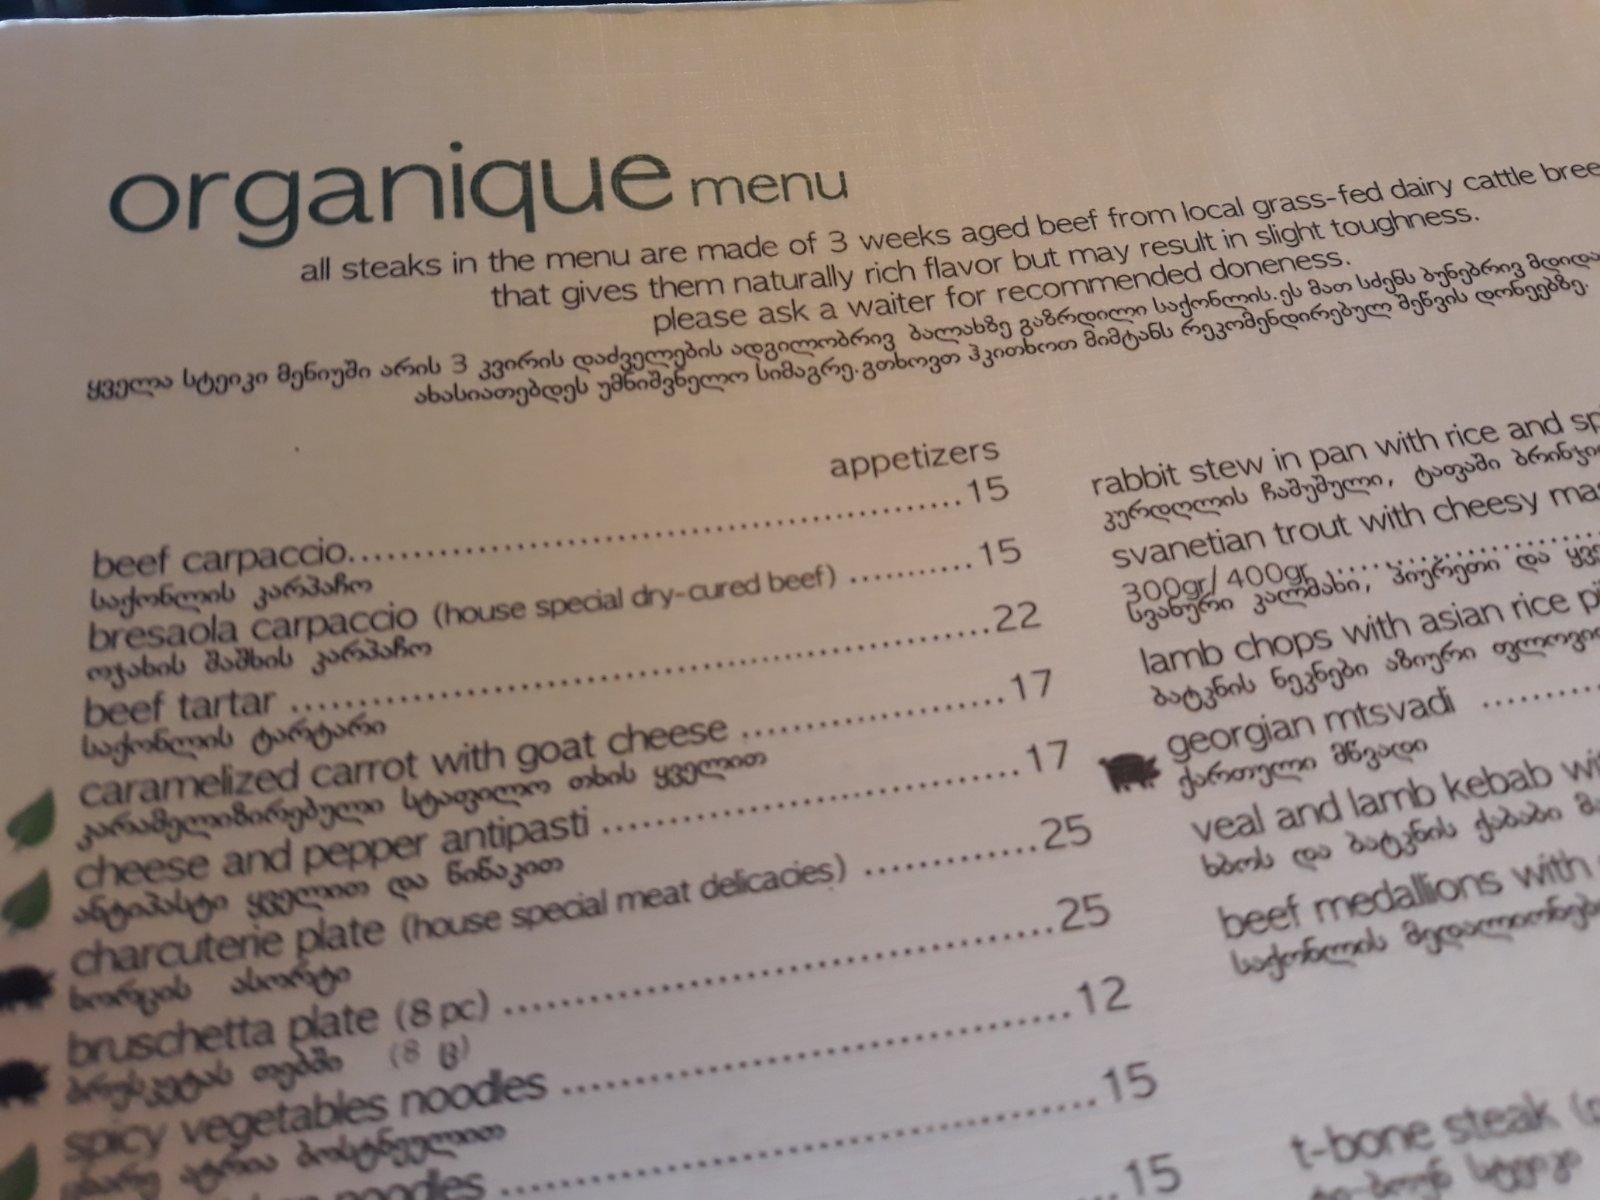 Organique menu